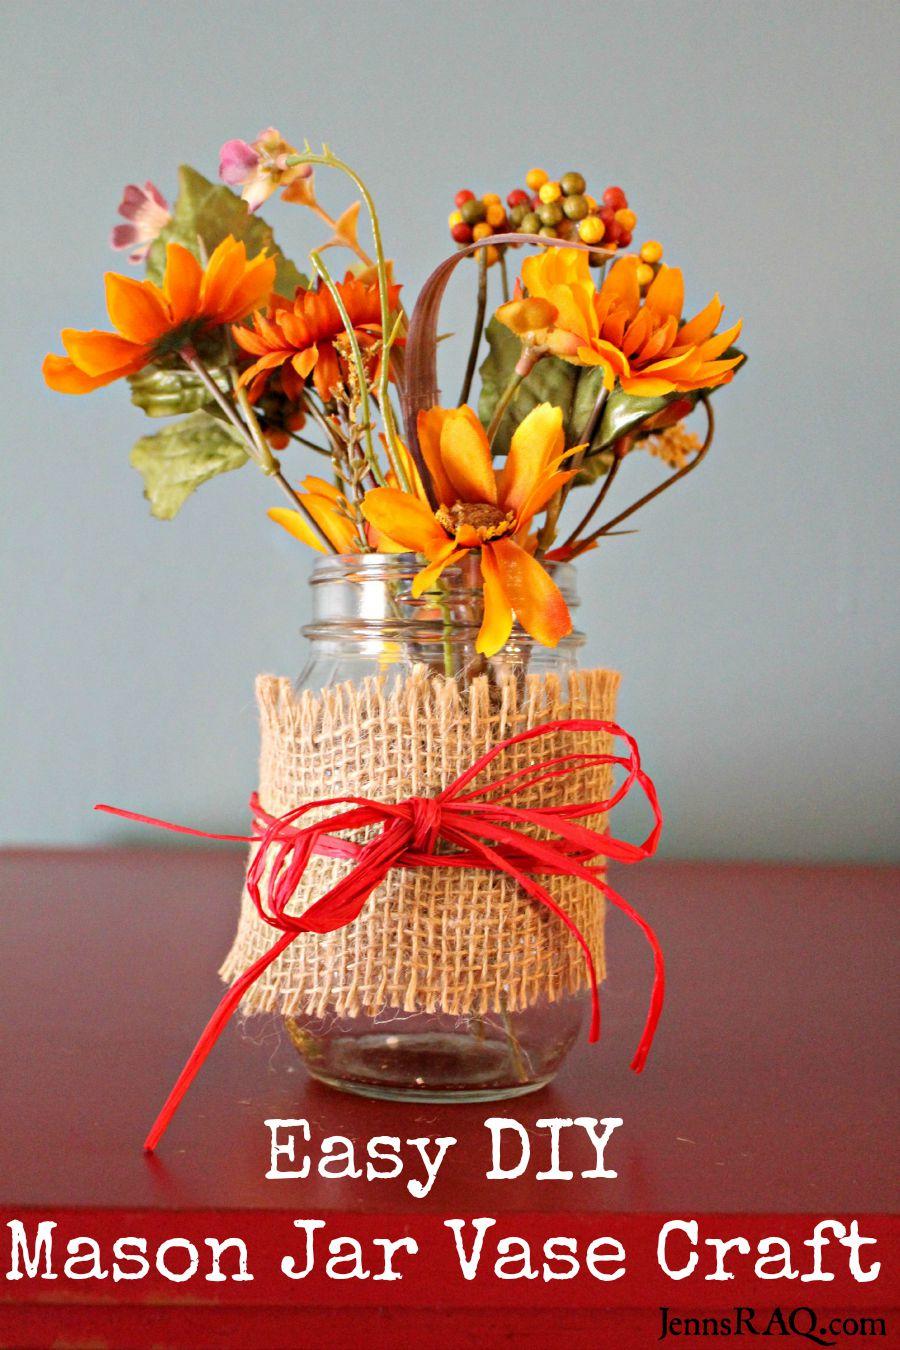 Easy DIY Mason Jar Vase Craft - Rustic - as seen on JennsRAQ.com